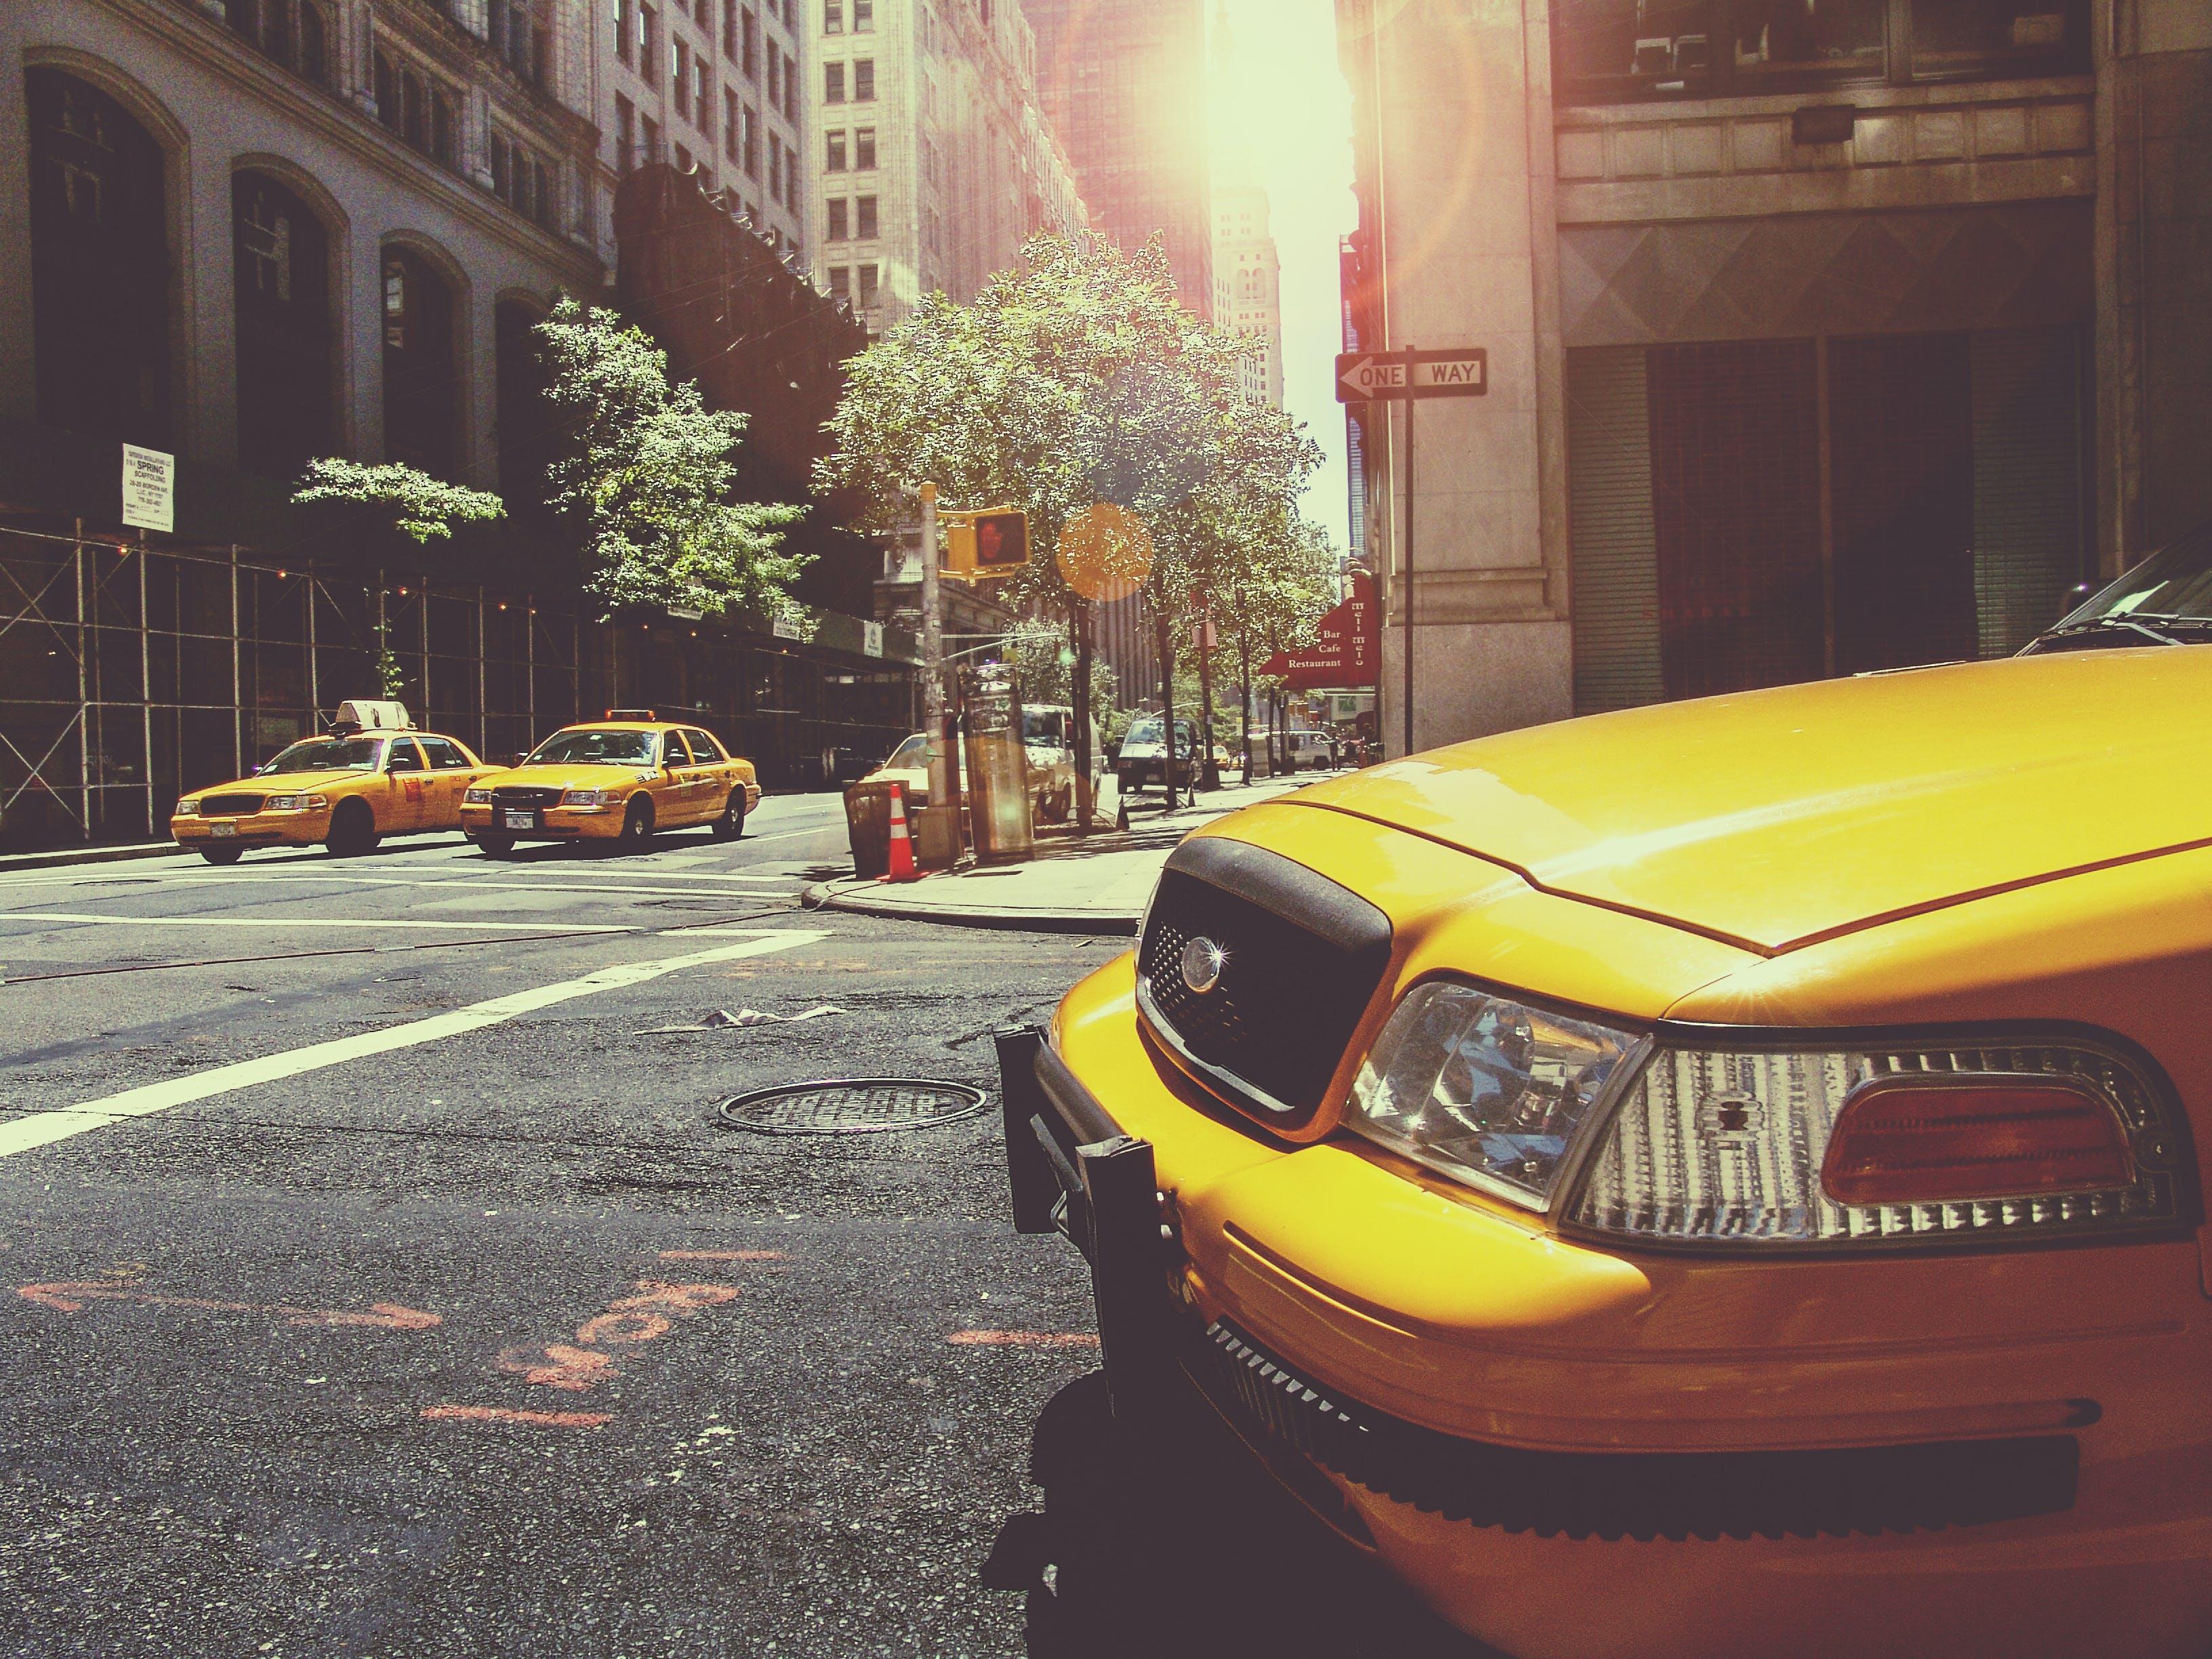 cab, cars, city